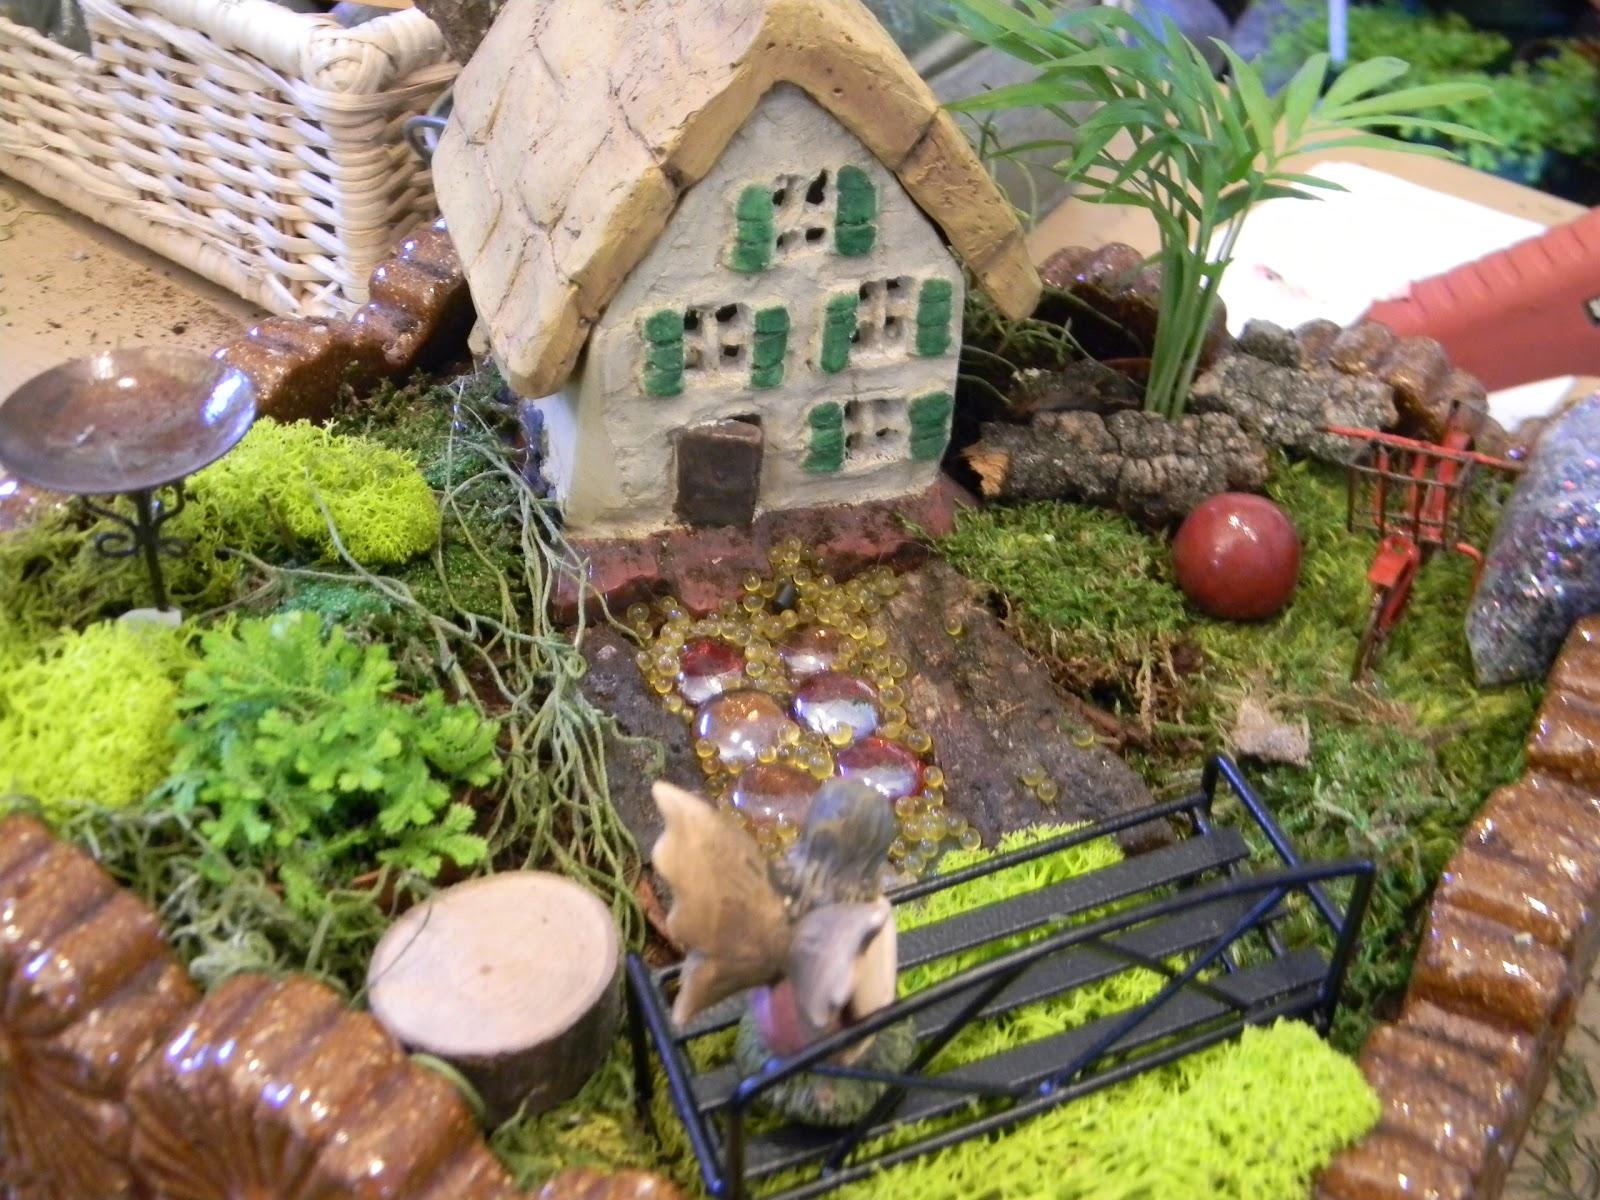 the royal gardens fairy garden workshop this saturday